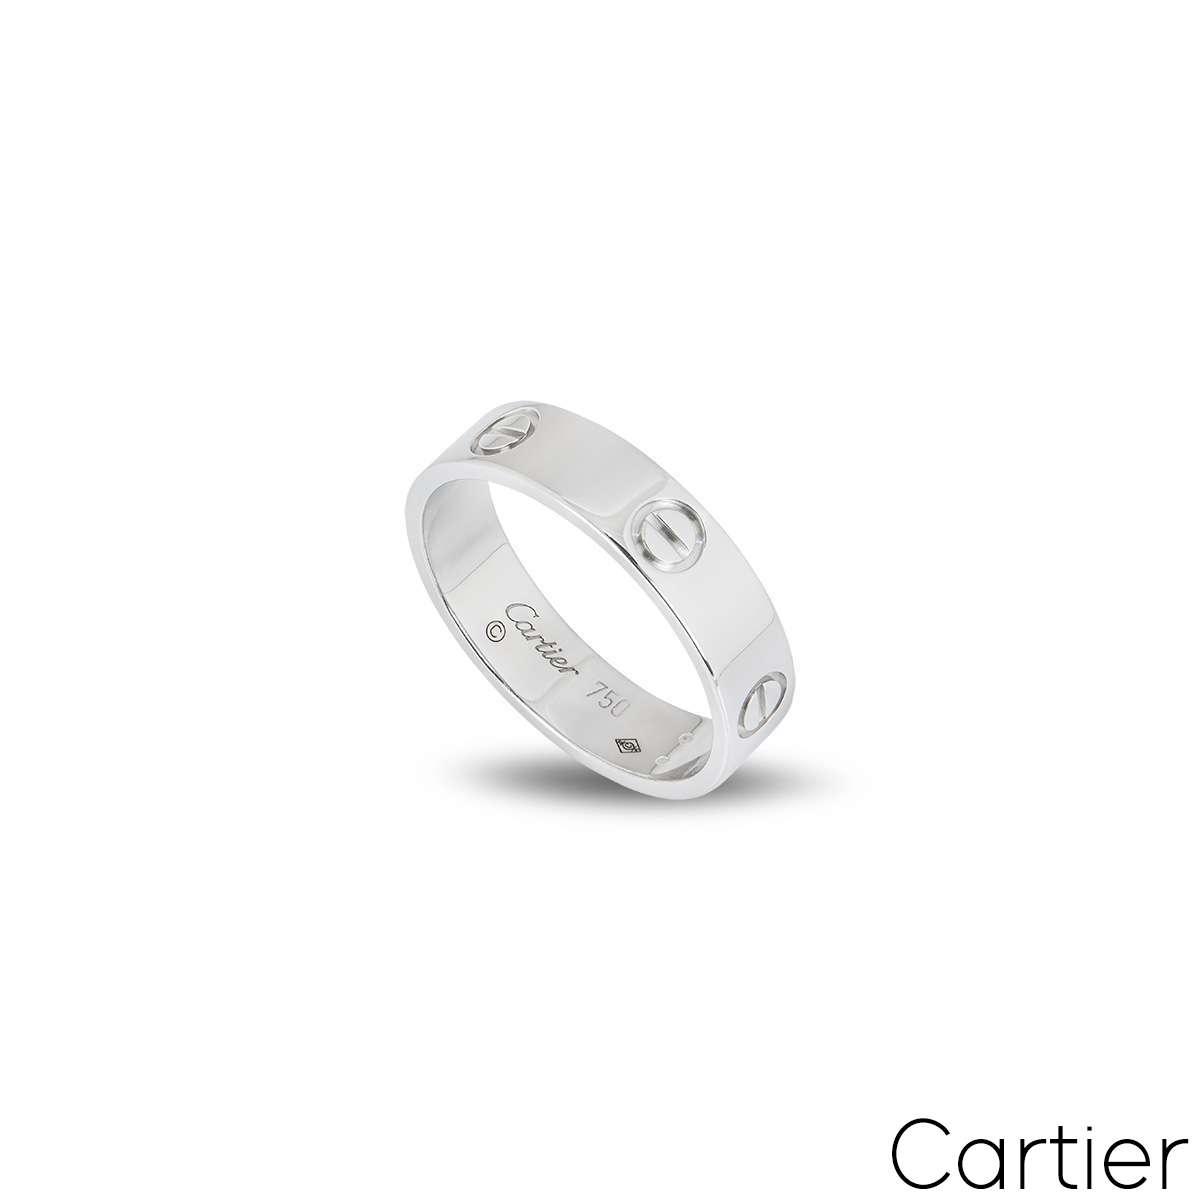 Cartier White Gold Plain Love Ring Size 56 B4084700